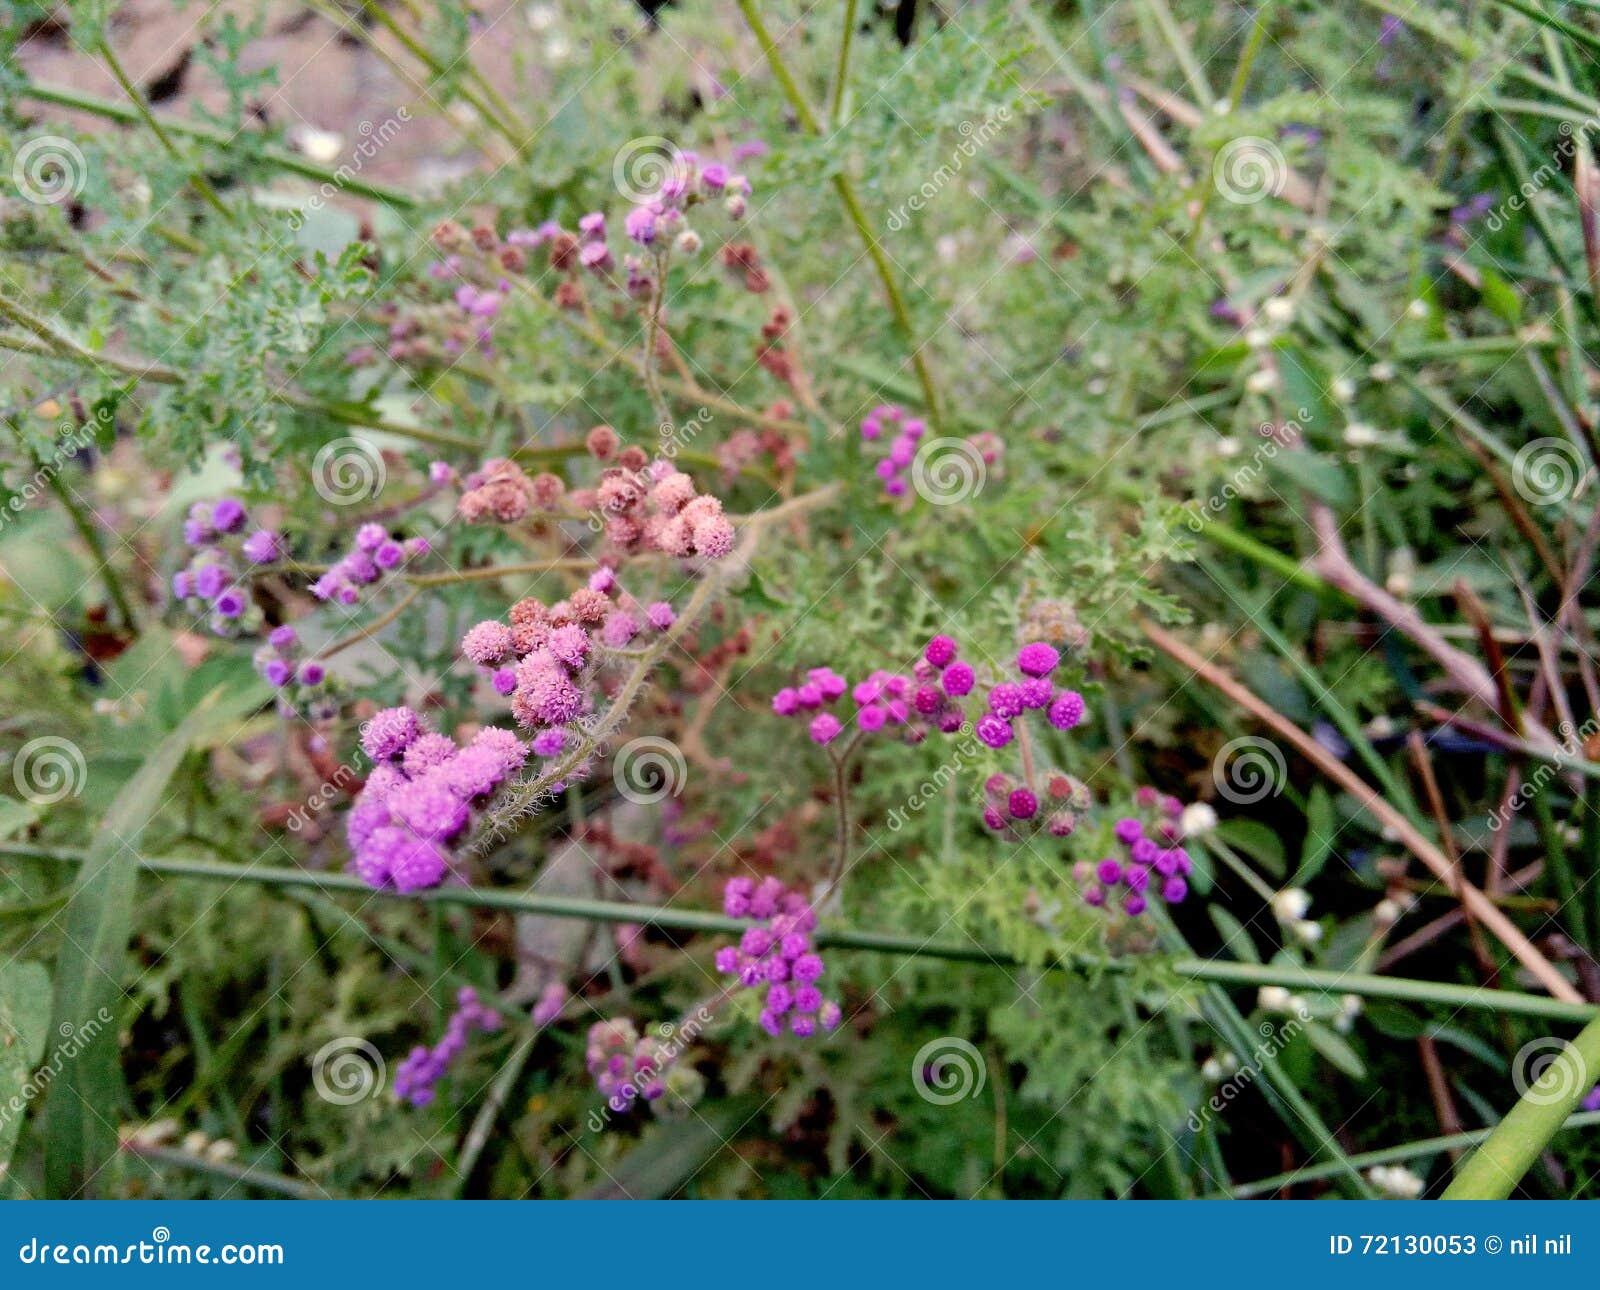 Rare Pink Purple Flowers Stock Image Image Of Multicolor 72130053